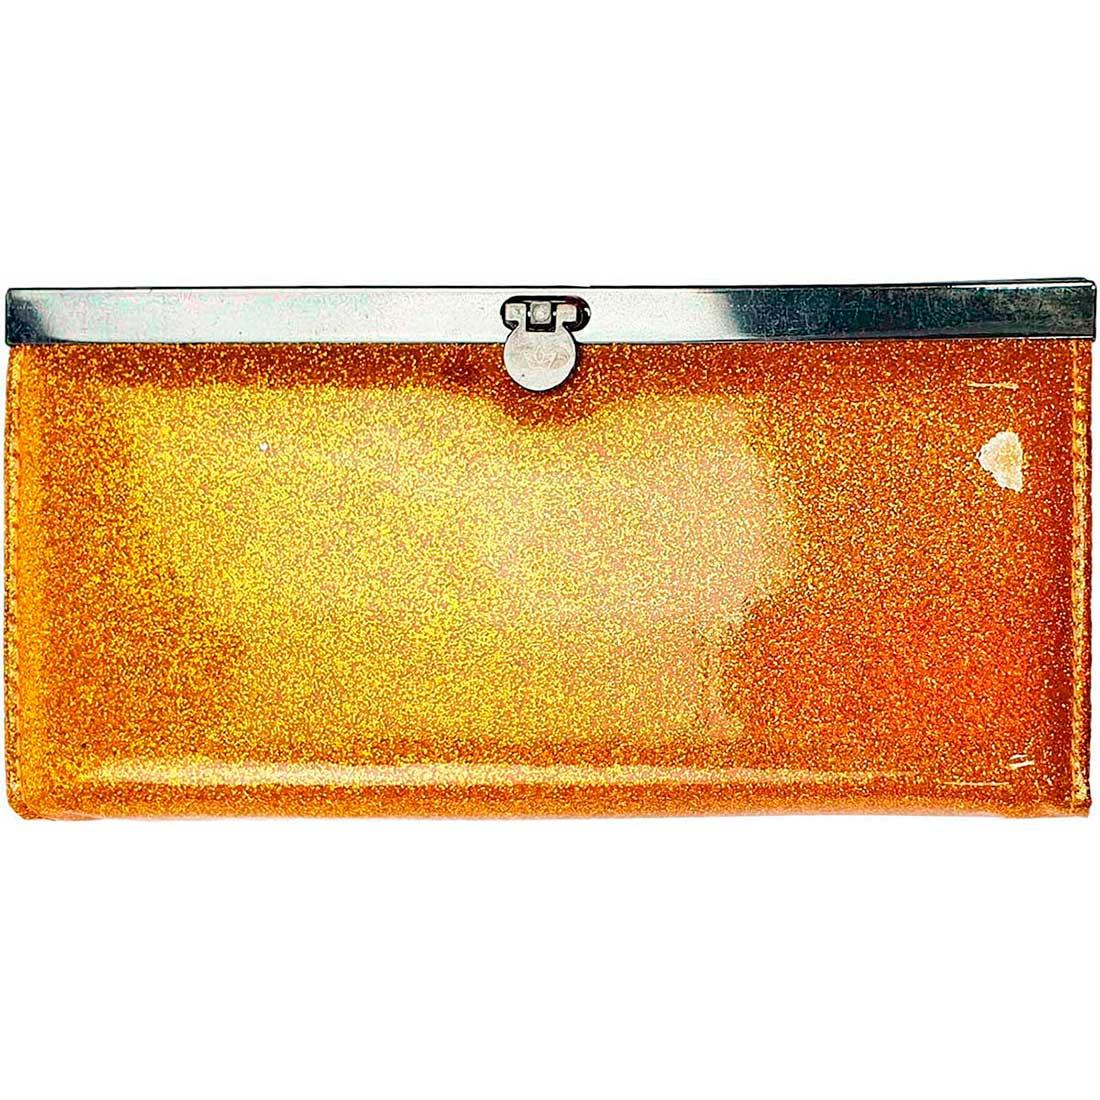 Carteira Glitter Verniz - Amarelo